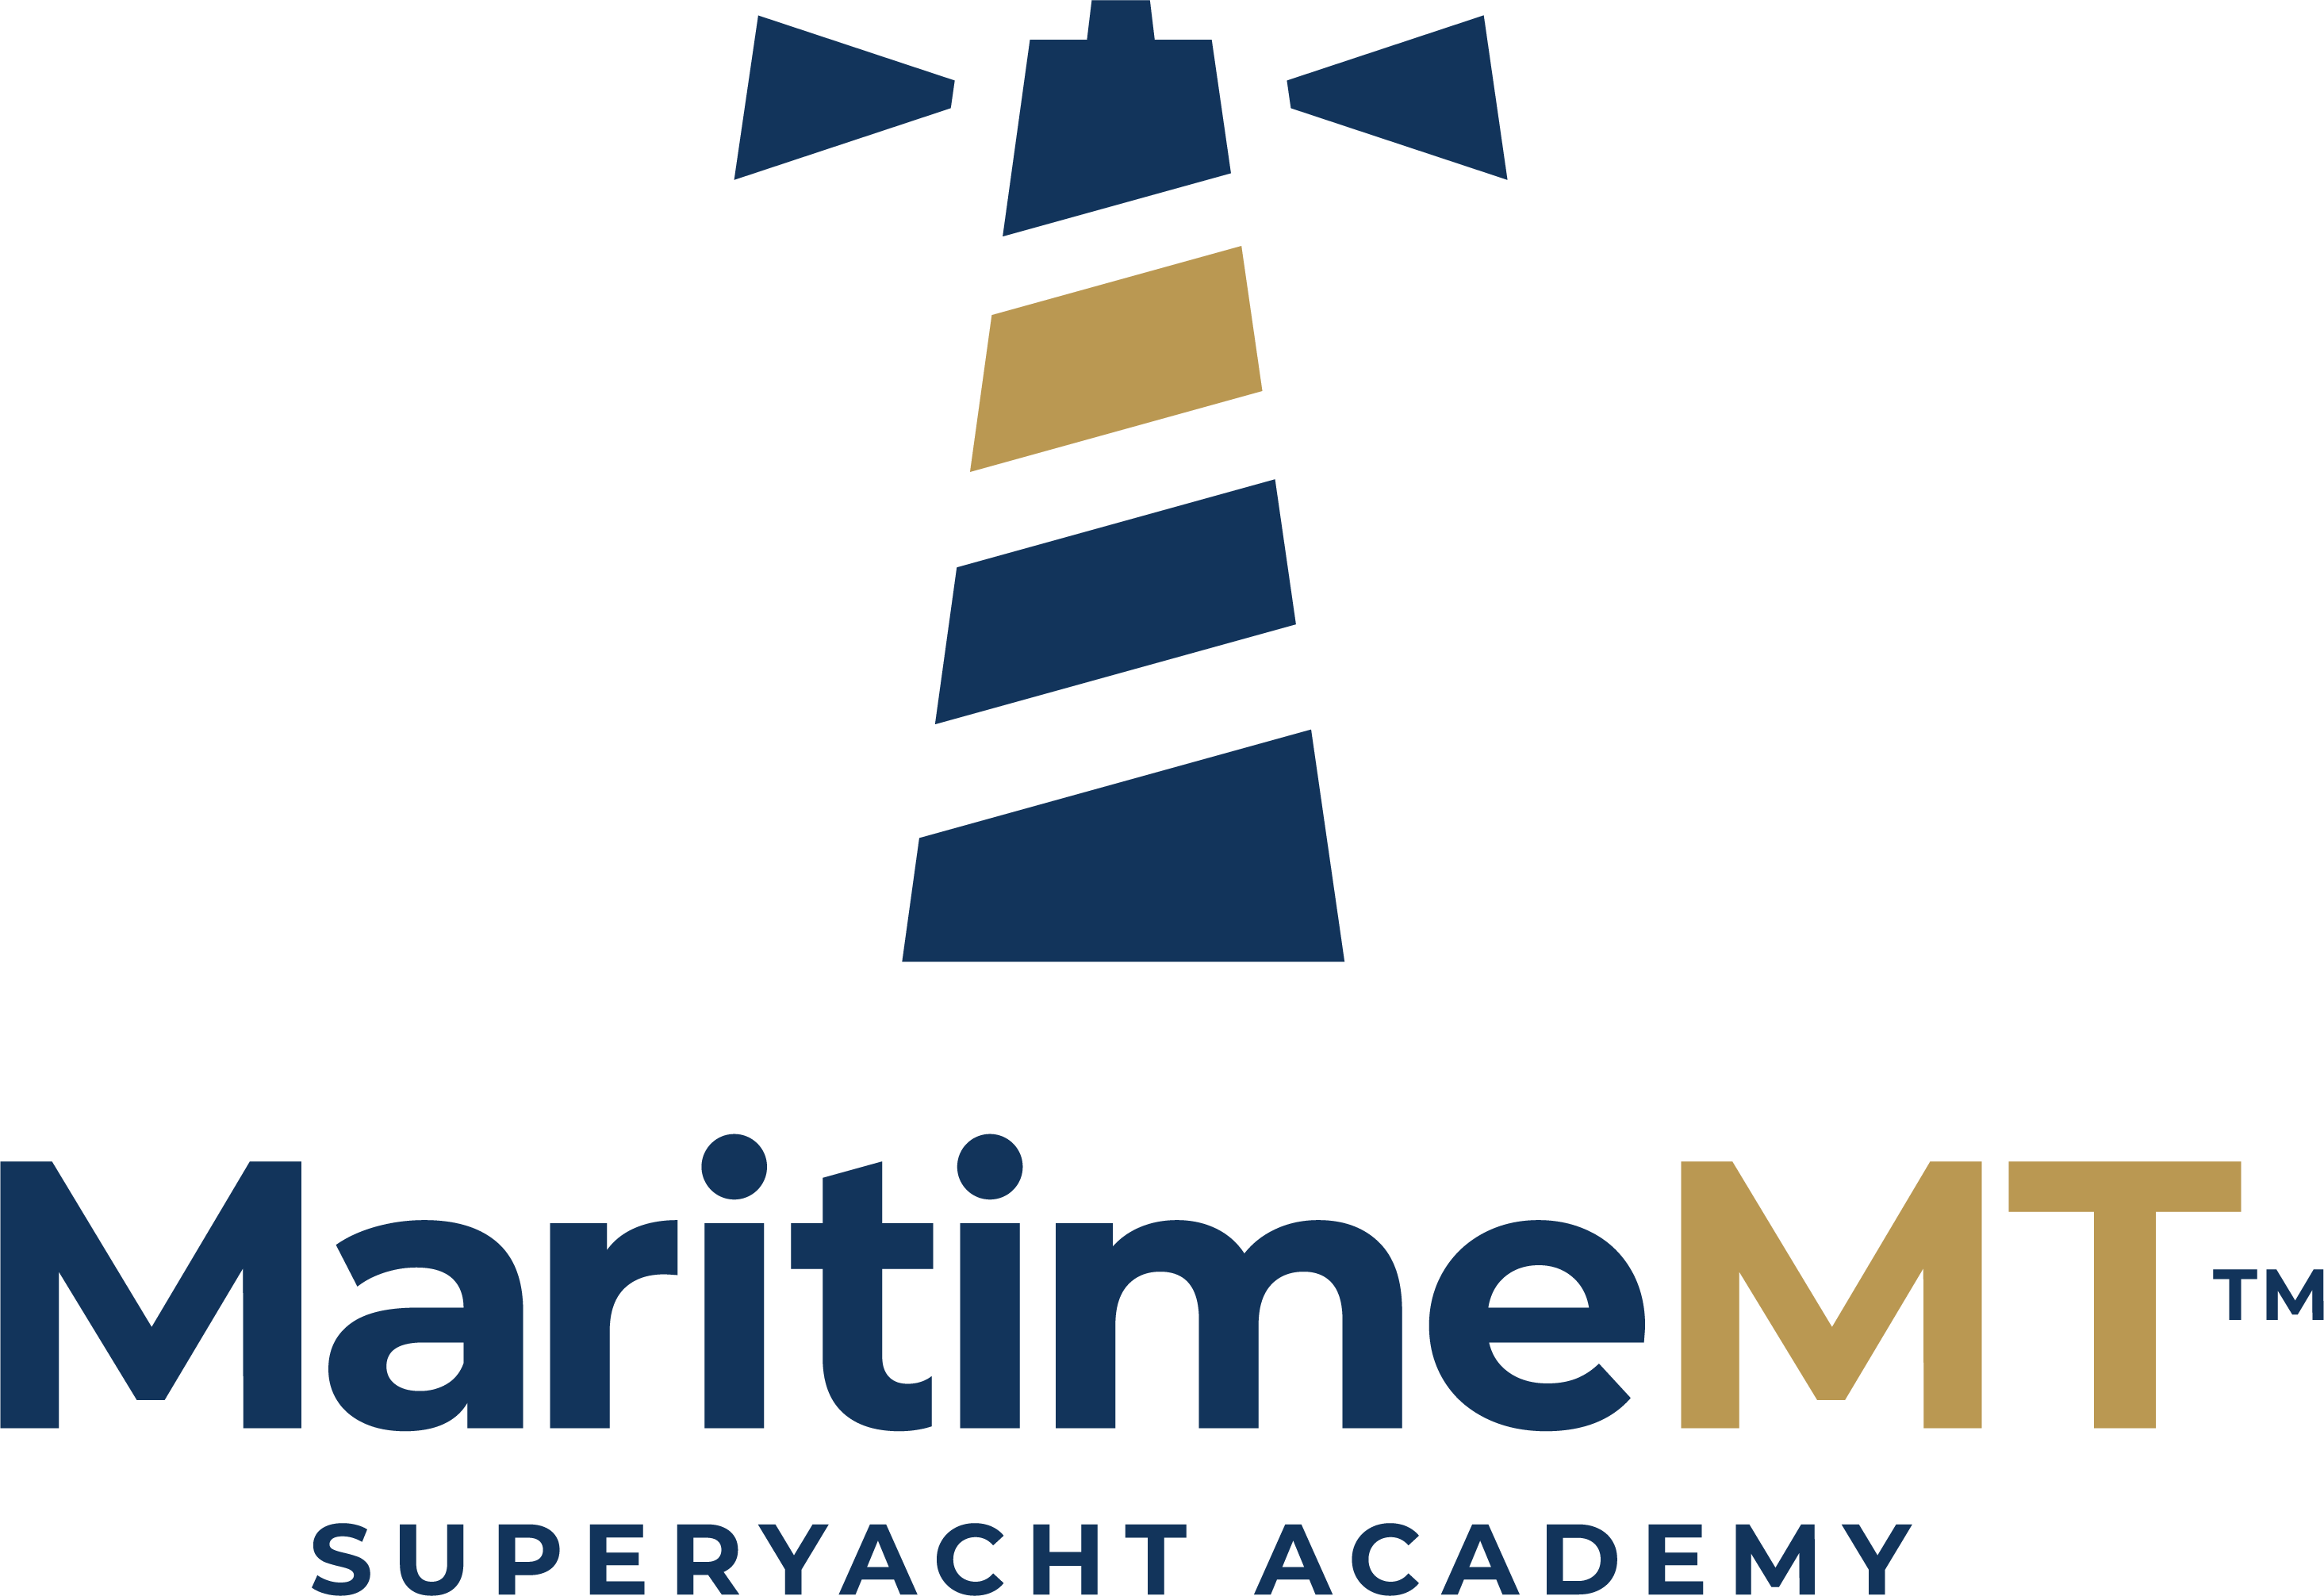 maritime mt superyacht academy